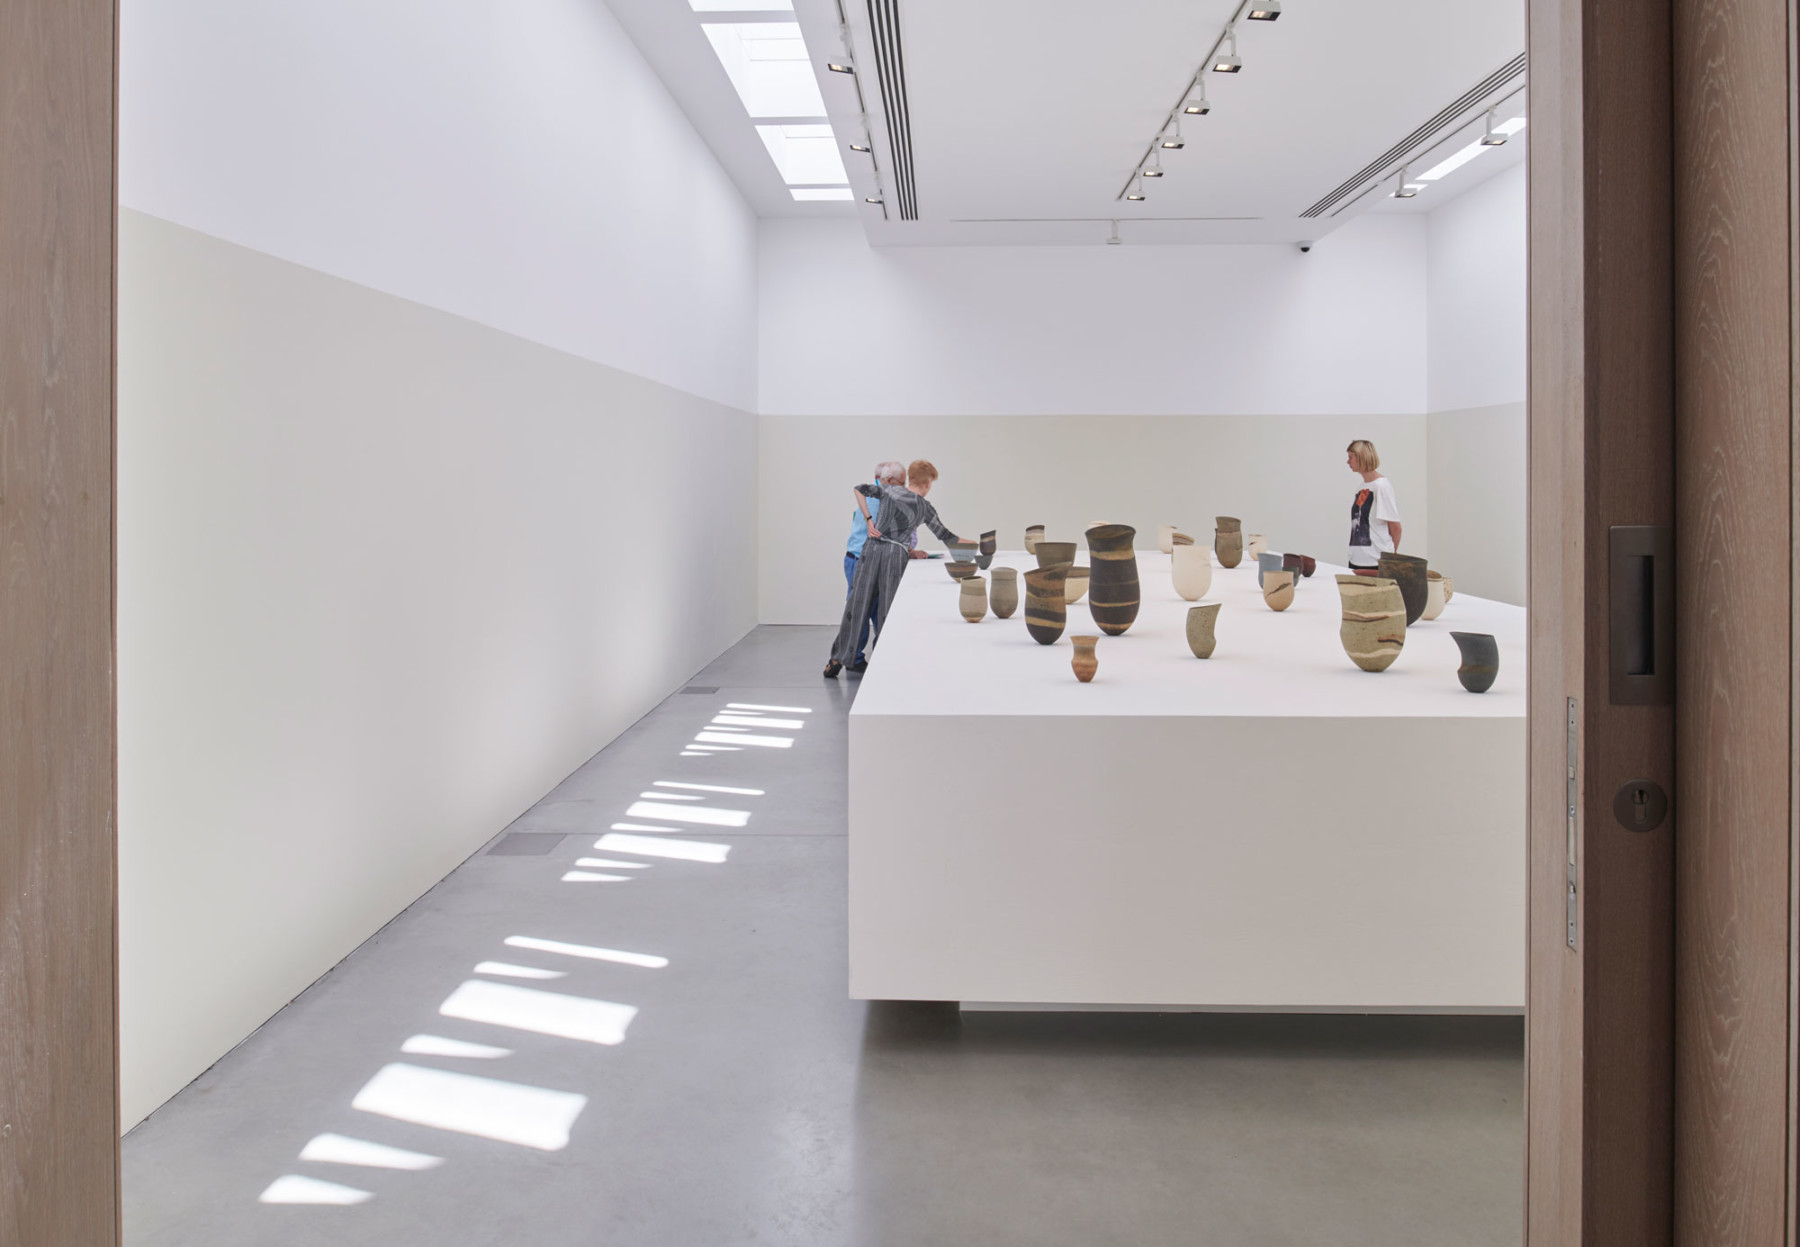 Jamie-fobert-architects-exhibition-design-gallery-Jennifer-Lee Kettles-Yard Jo-Underhill-812